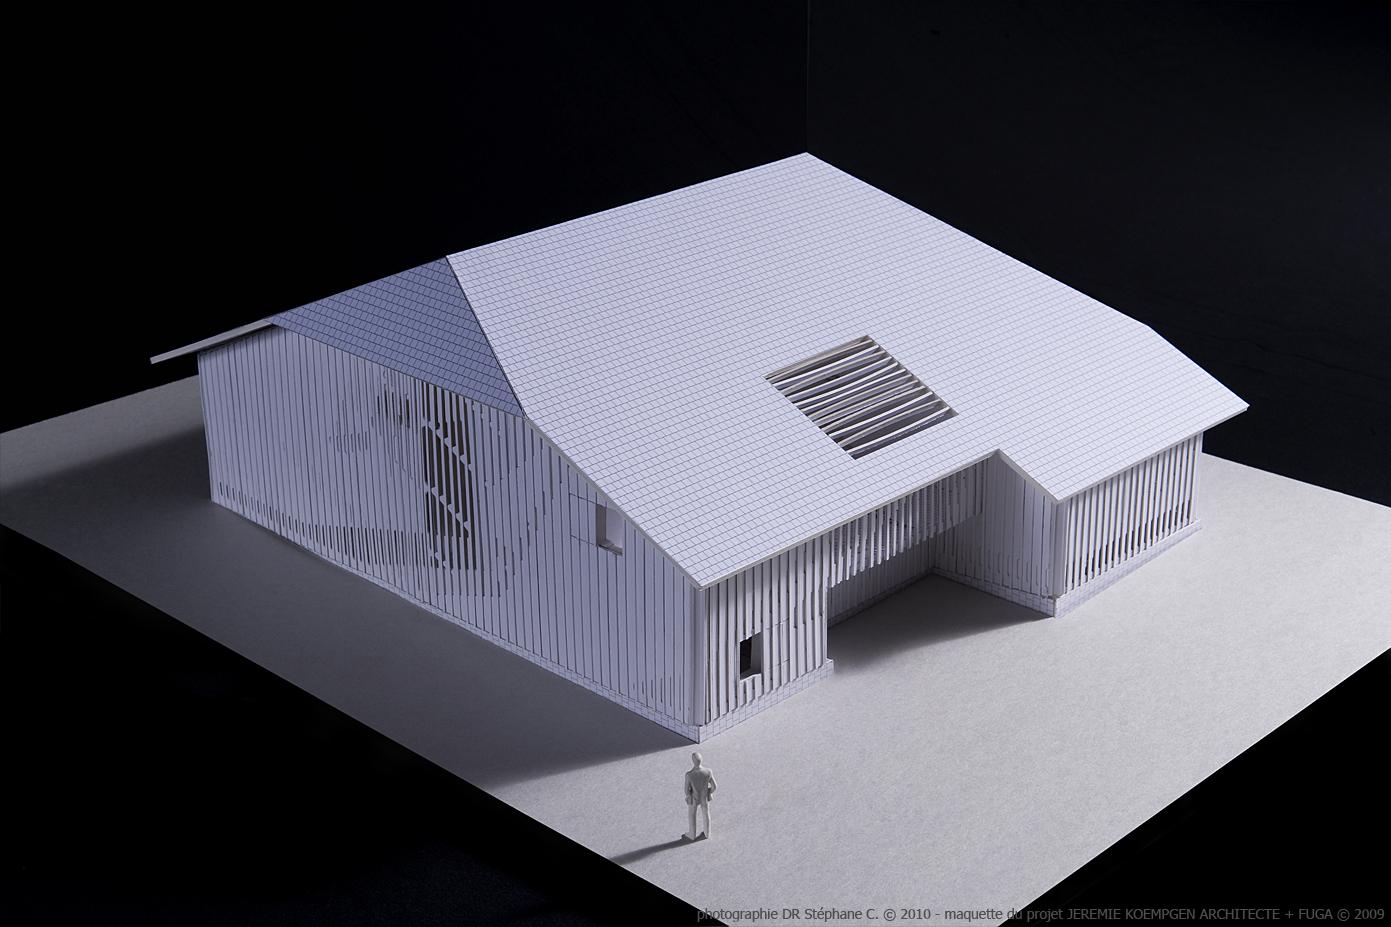 KOGI-MORZ-PLAN-11-Maquette1